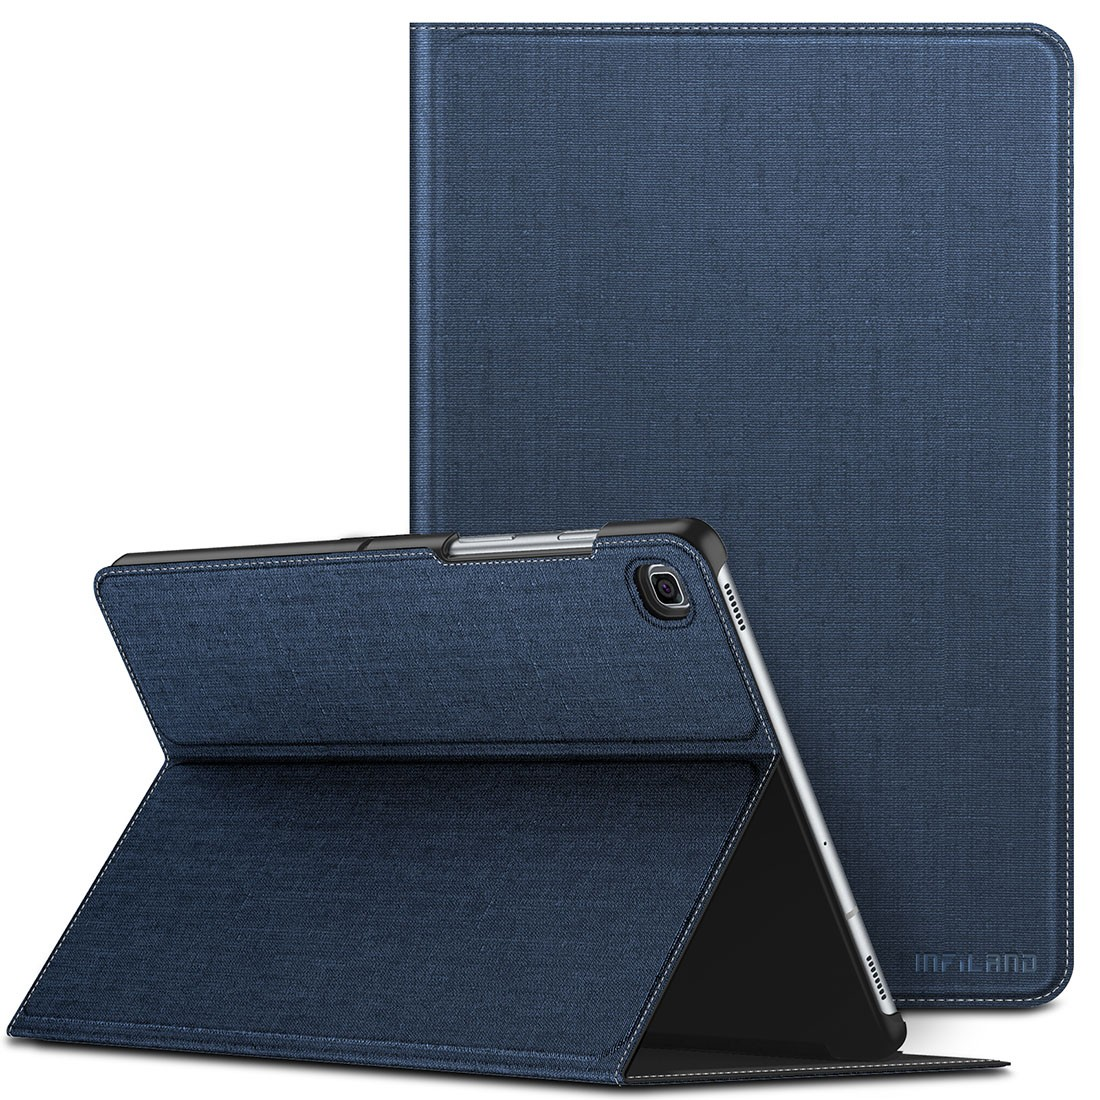 Capa Premium Classic Series com Fino Acabamento Galaxy Tab S5e 10.5 pol. (2019) T720 T725